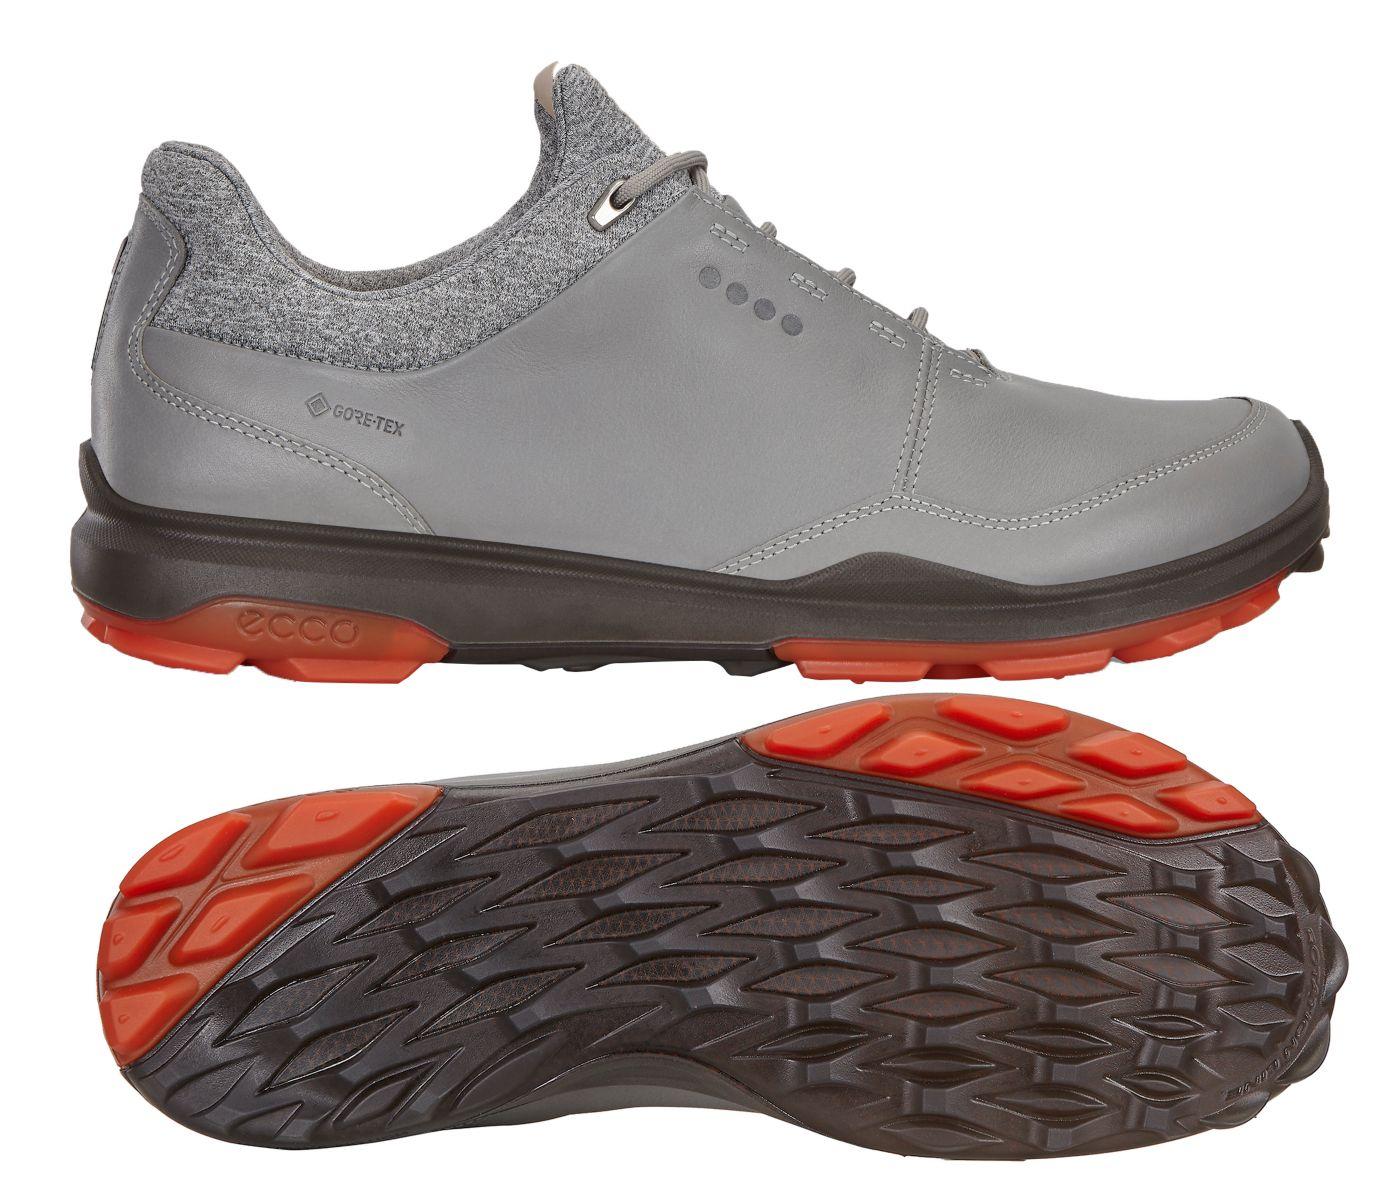 ECCO Men's Hybrid 3 Golf Shoes